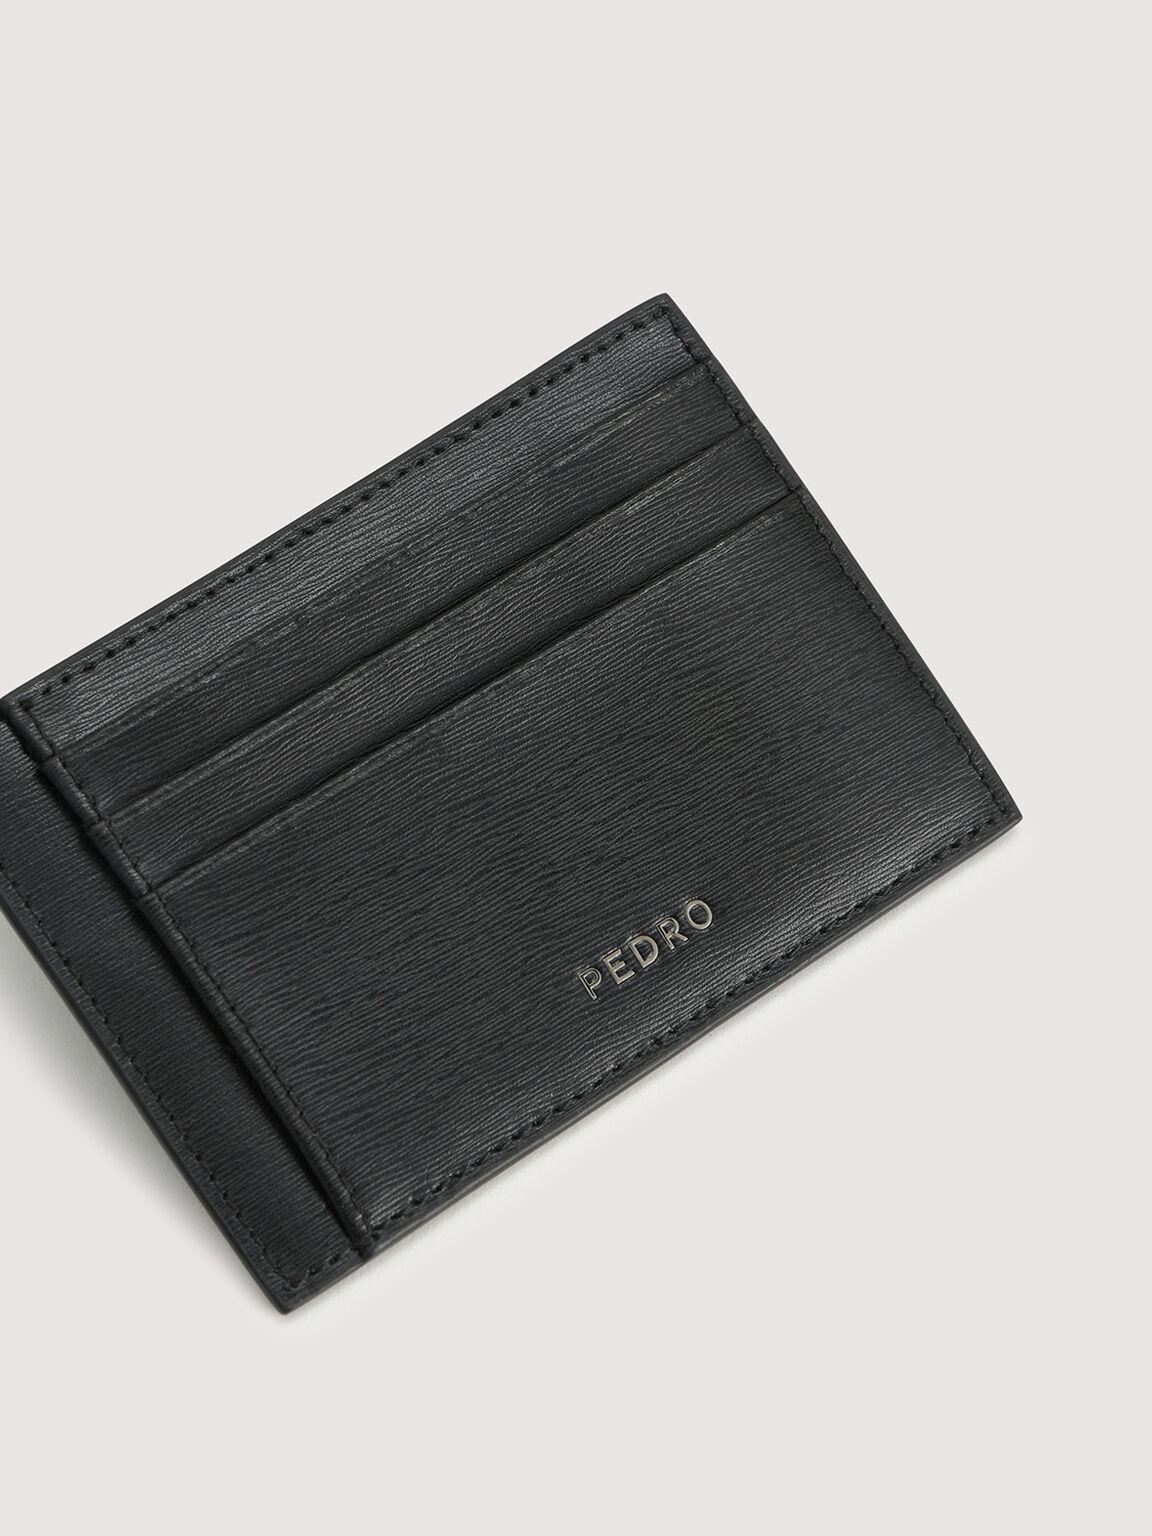 Leather Cardholder with Money Clip, Black, hi-res